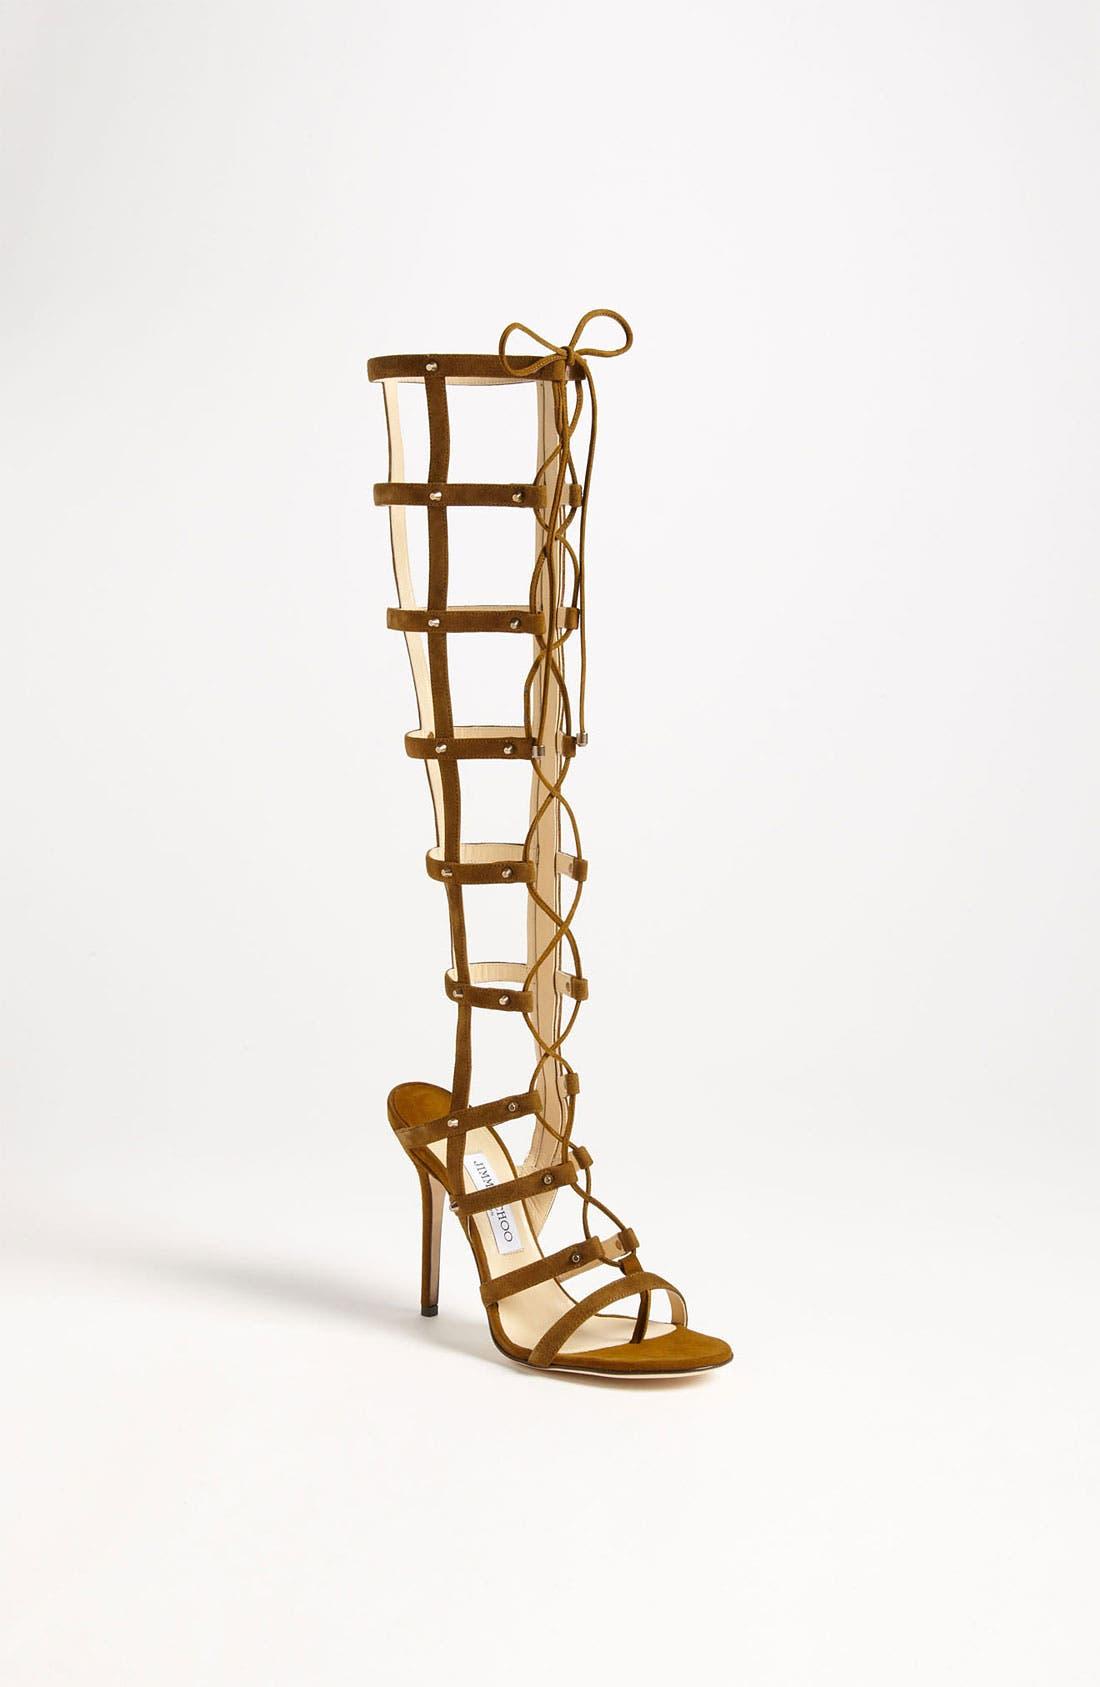 Main Image - Jimmy Choo 'Mogul' Caged Sandal Boot